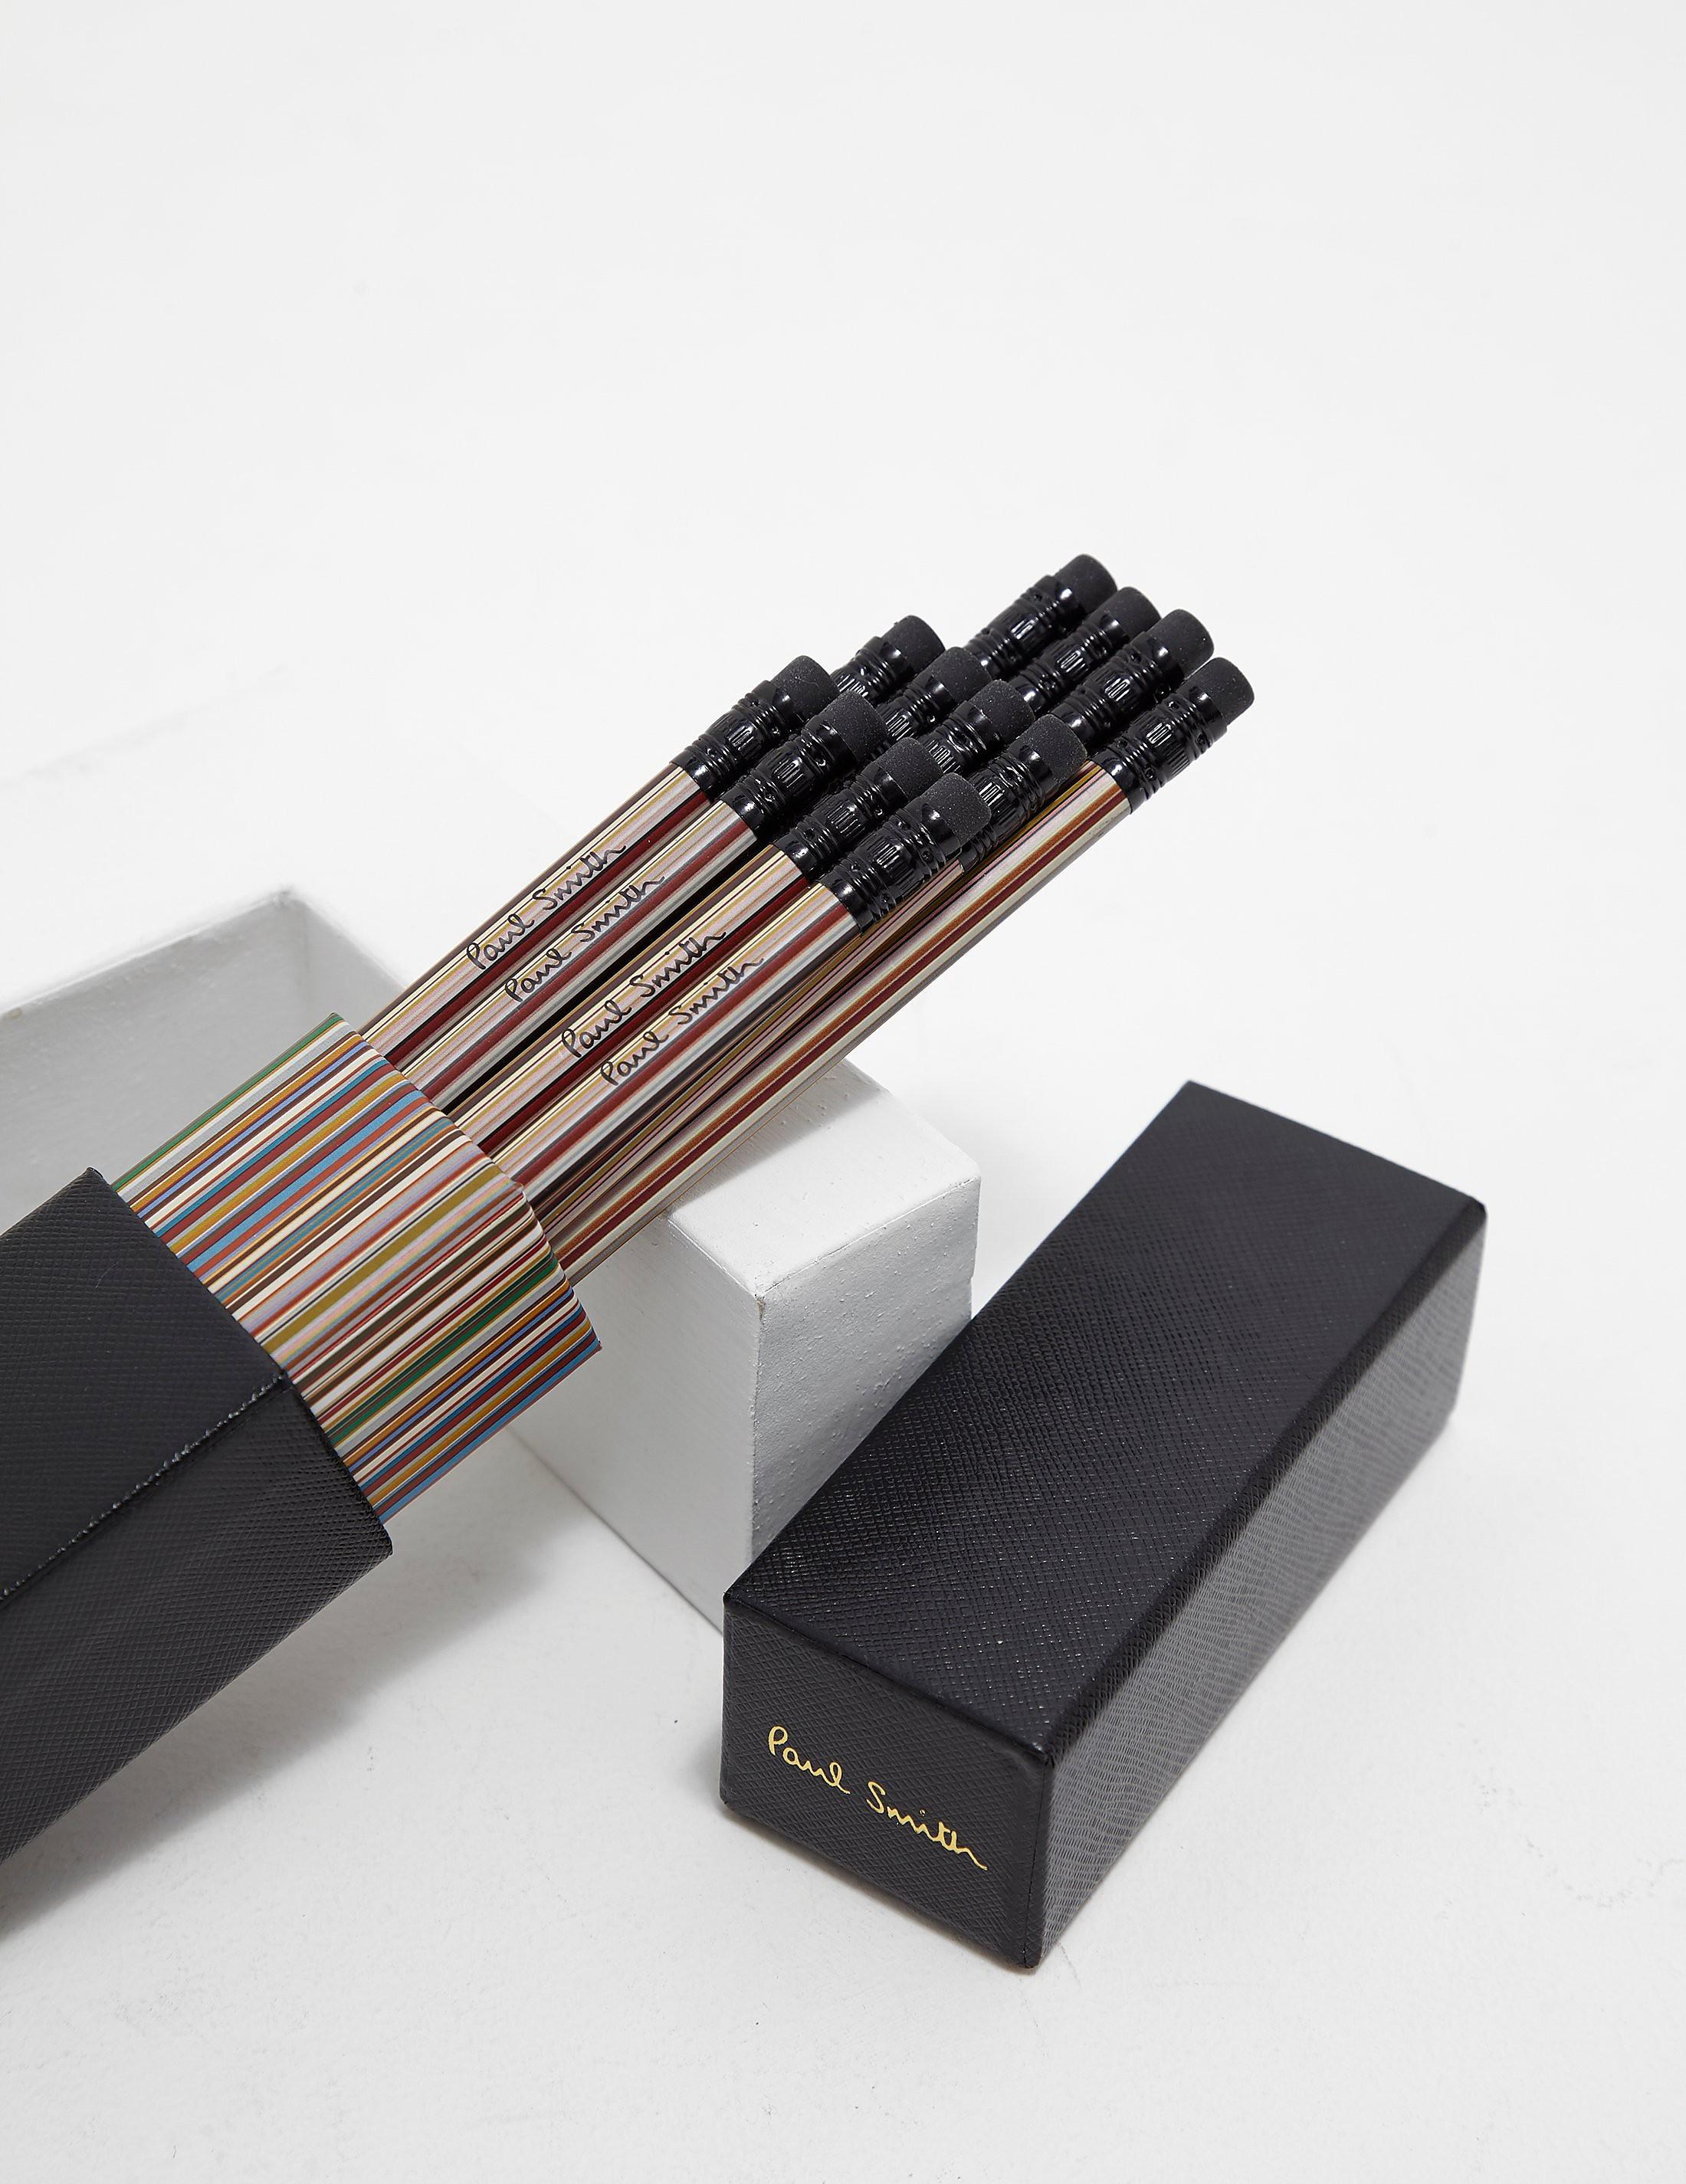 Paul Smith Pencil Gift Set